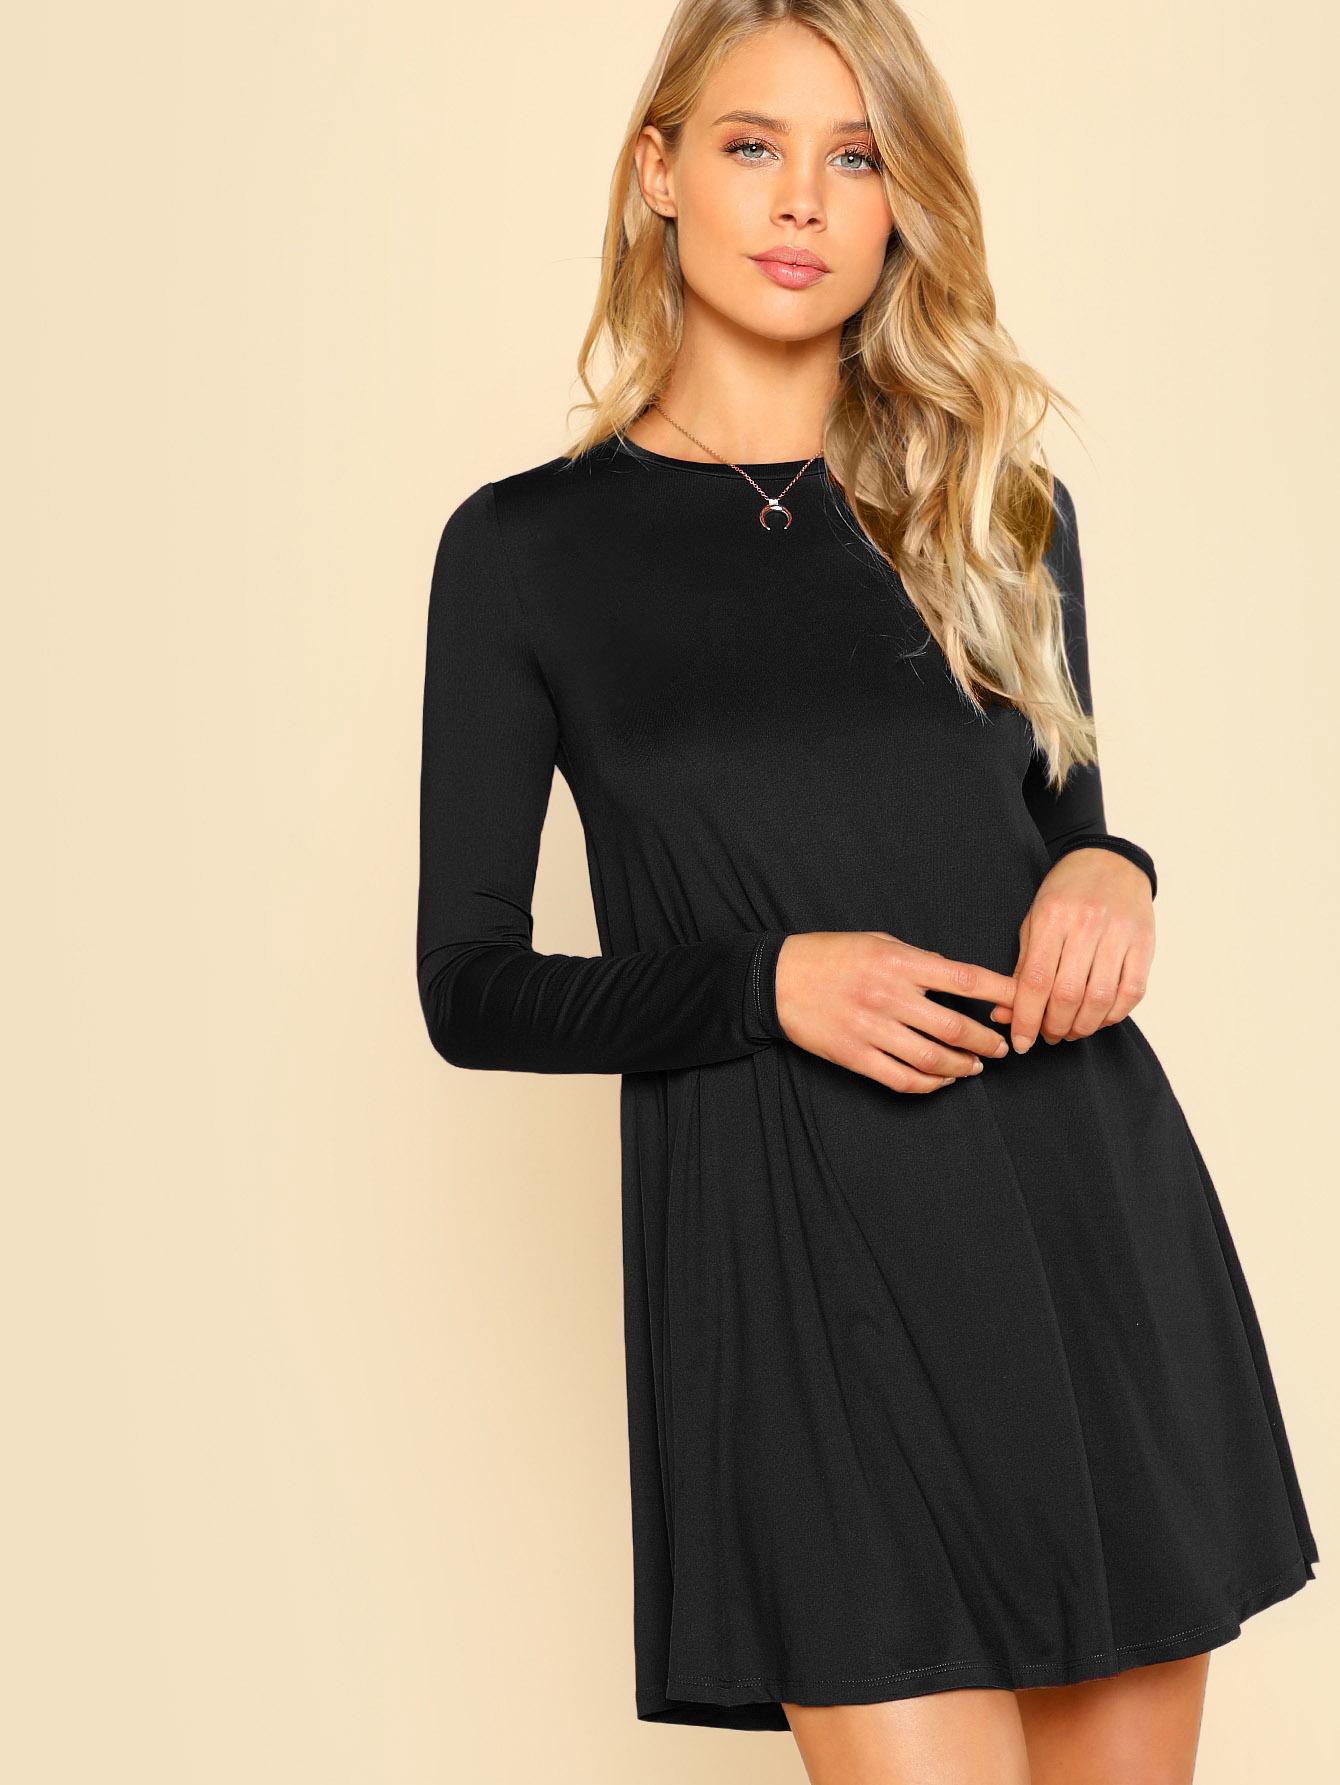 b77da85c98 Long Sleeve Solid Swing Dress -SheIn(Sheinside)